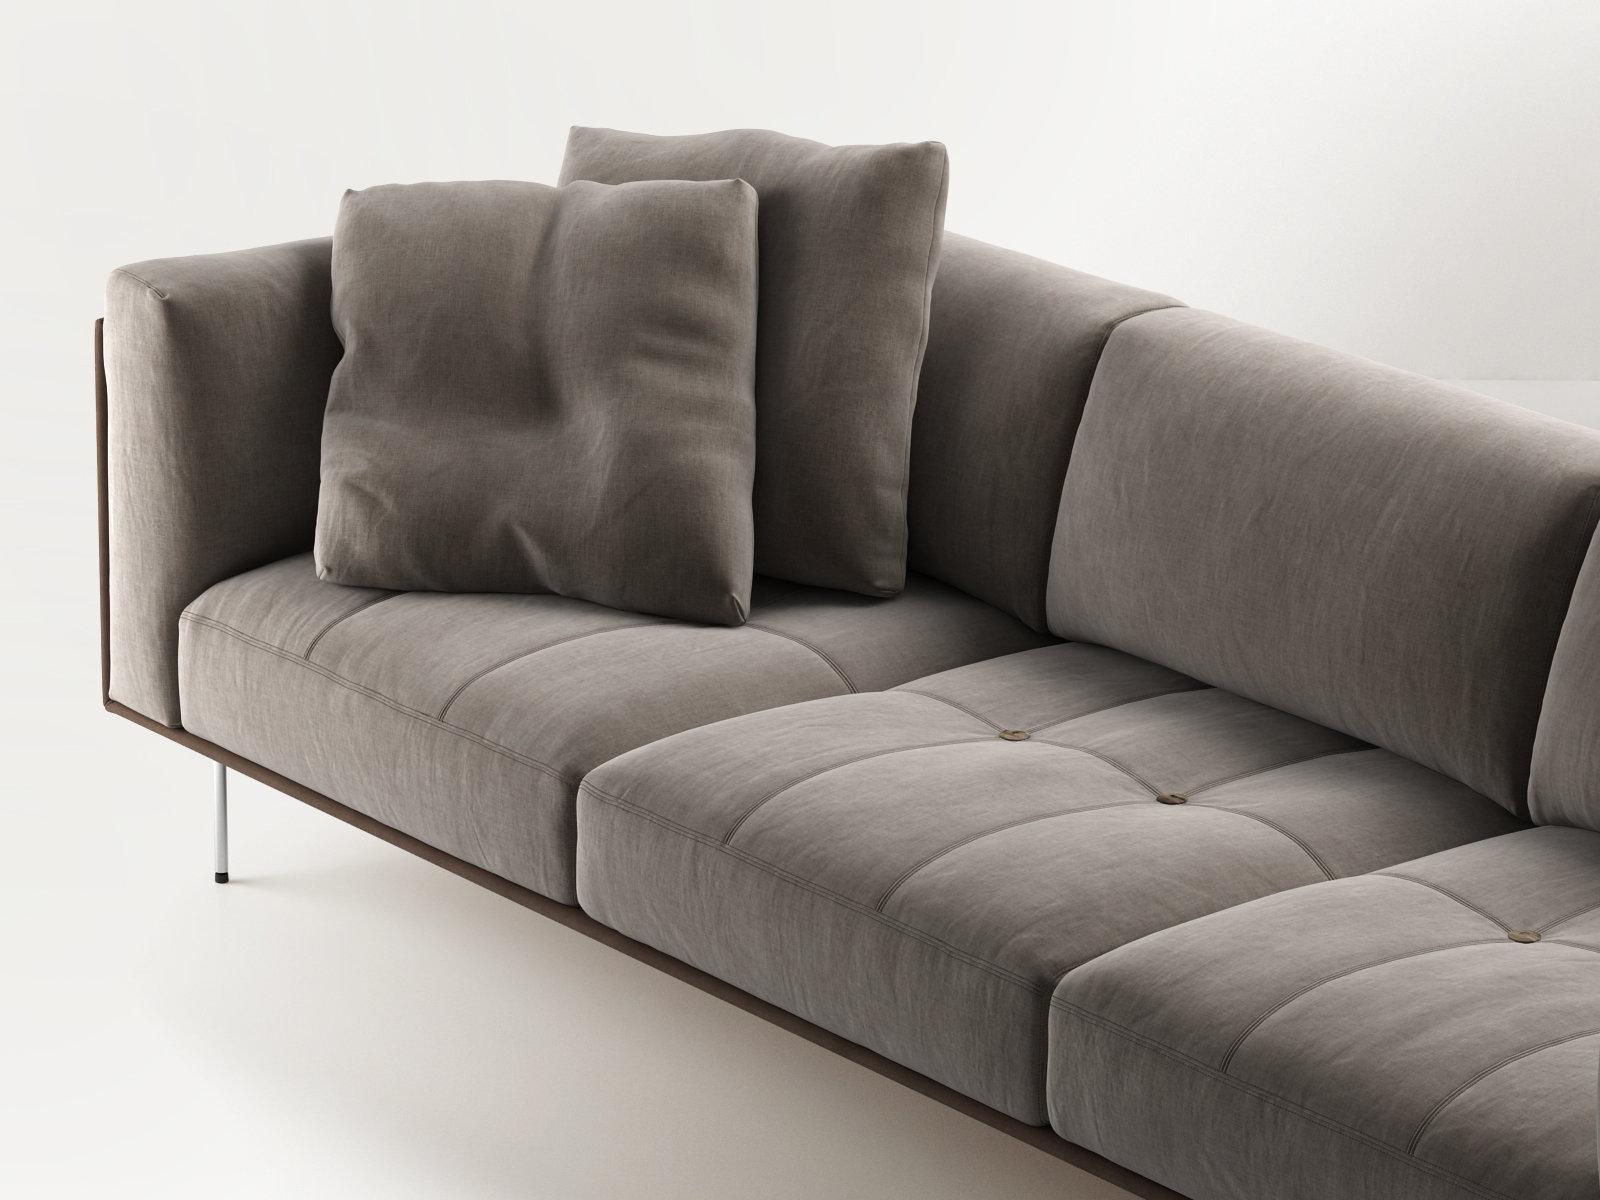 rod sofa 240 modello 3d living divani. Black Bedroom Furniture Sets. Home Design Ideas